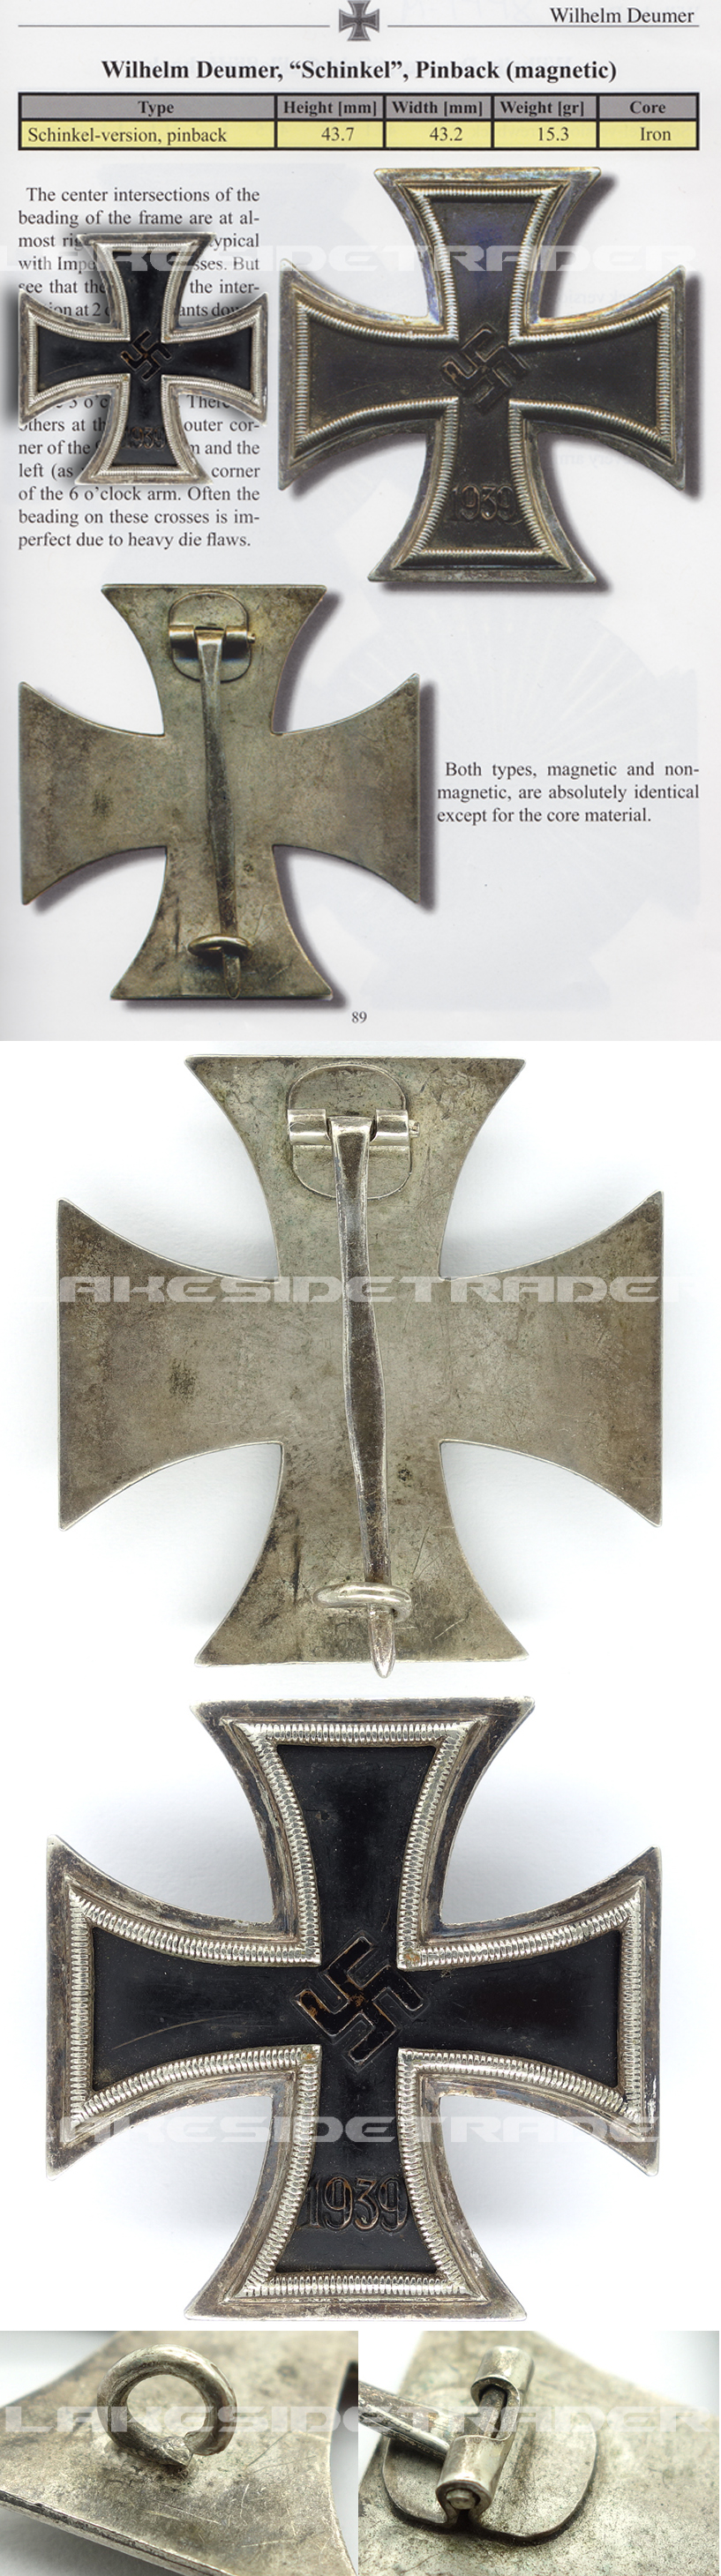 THE Textbook Example – Schinkel 1st Class Iron Cross by W. Deumer